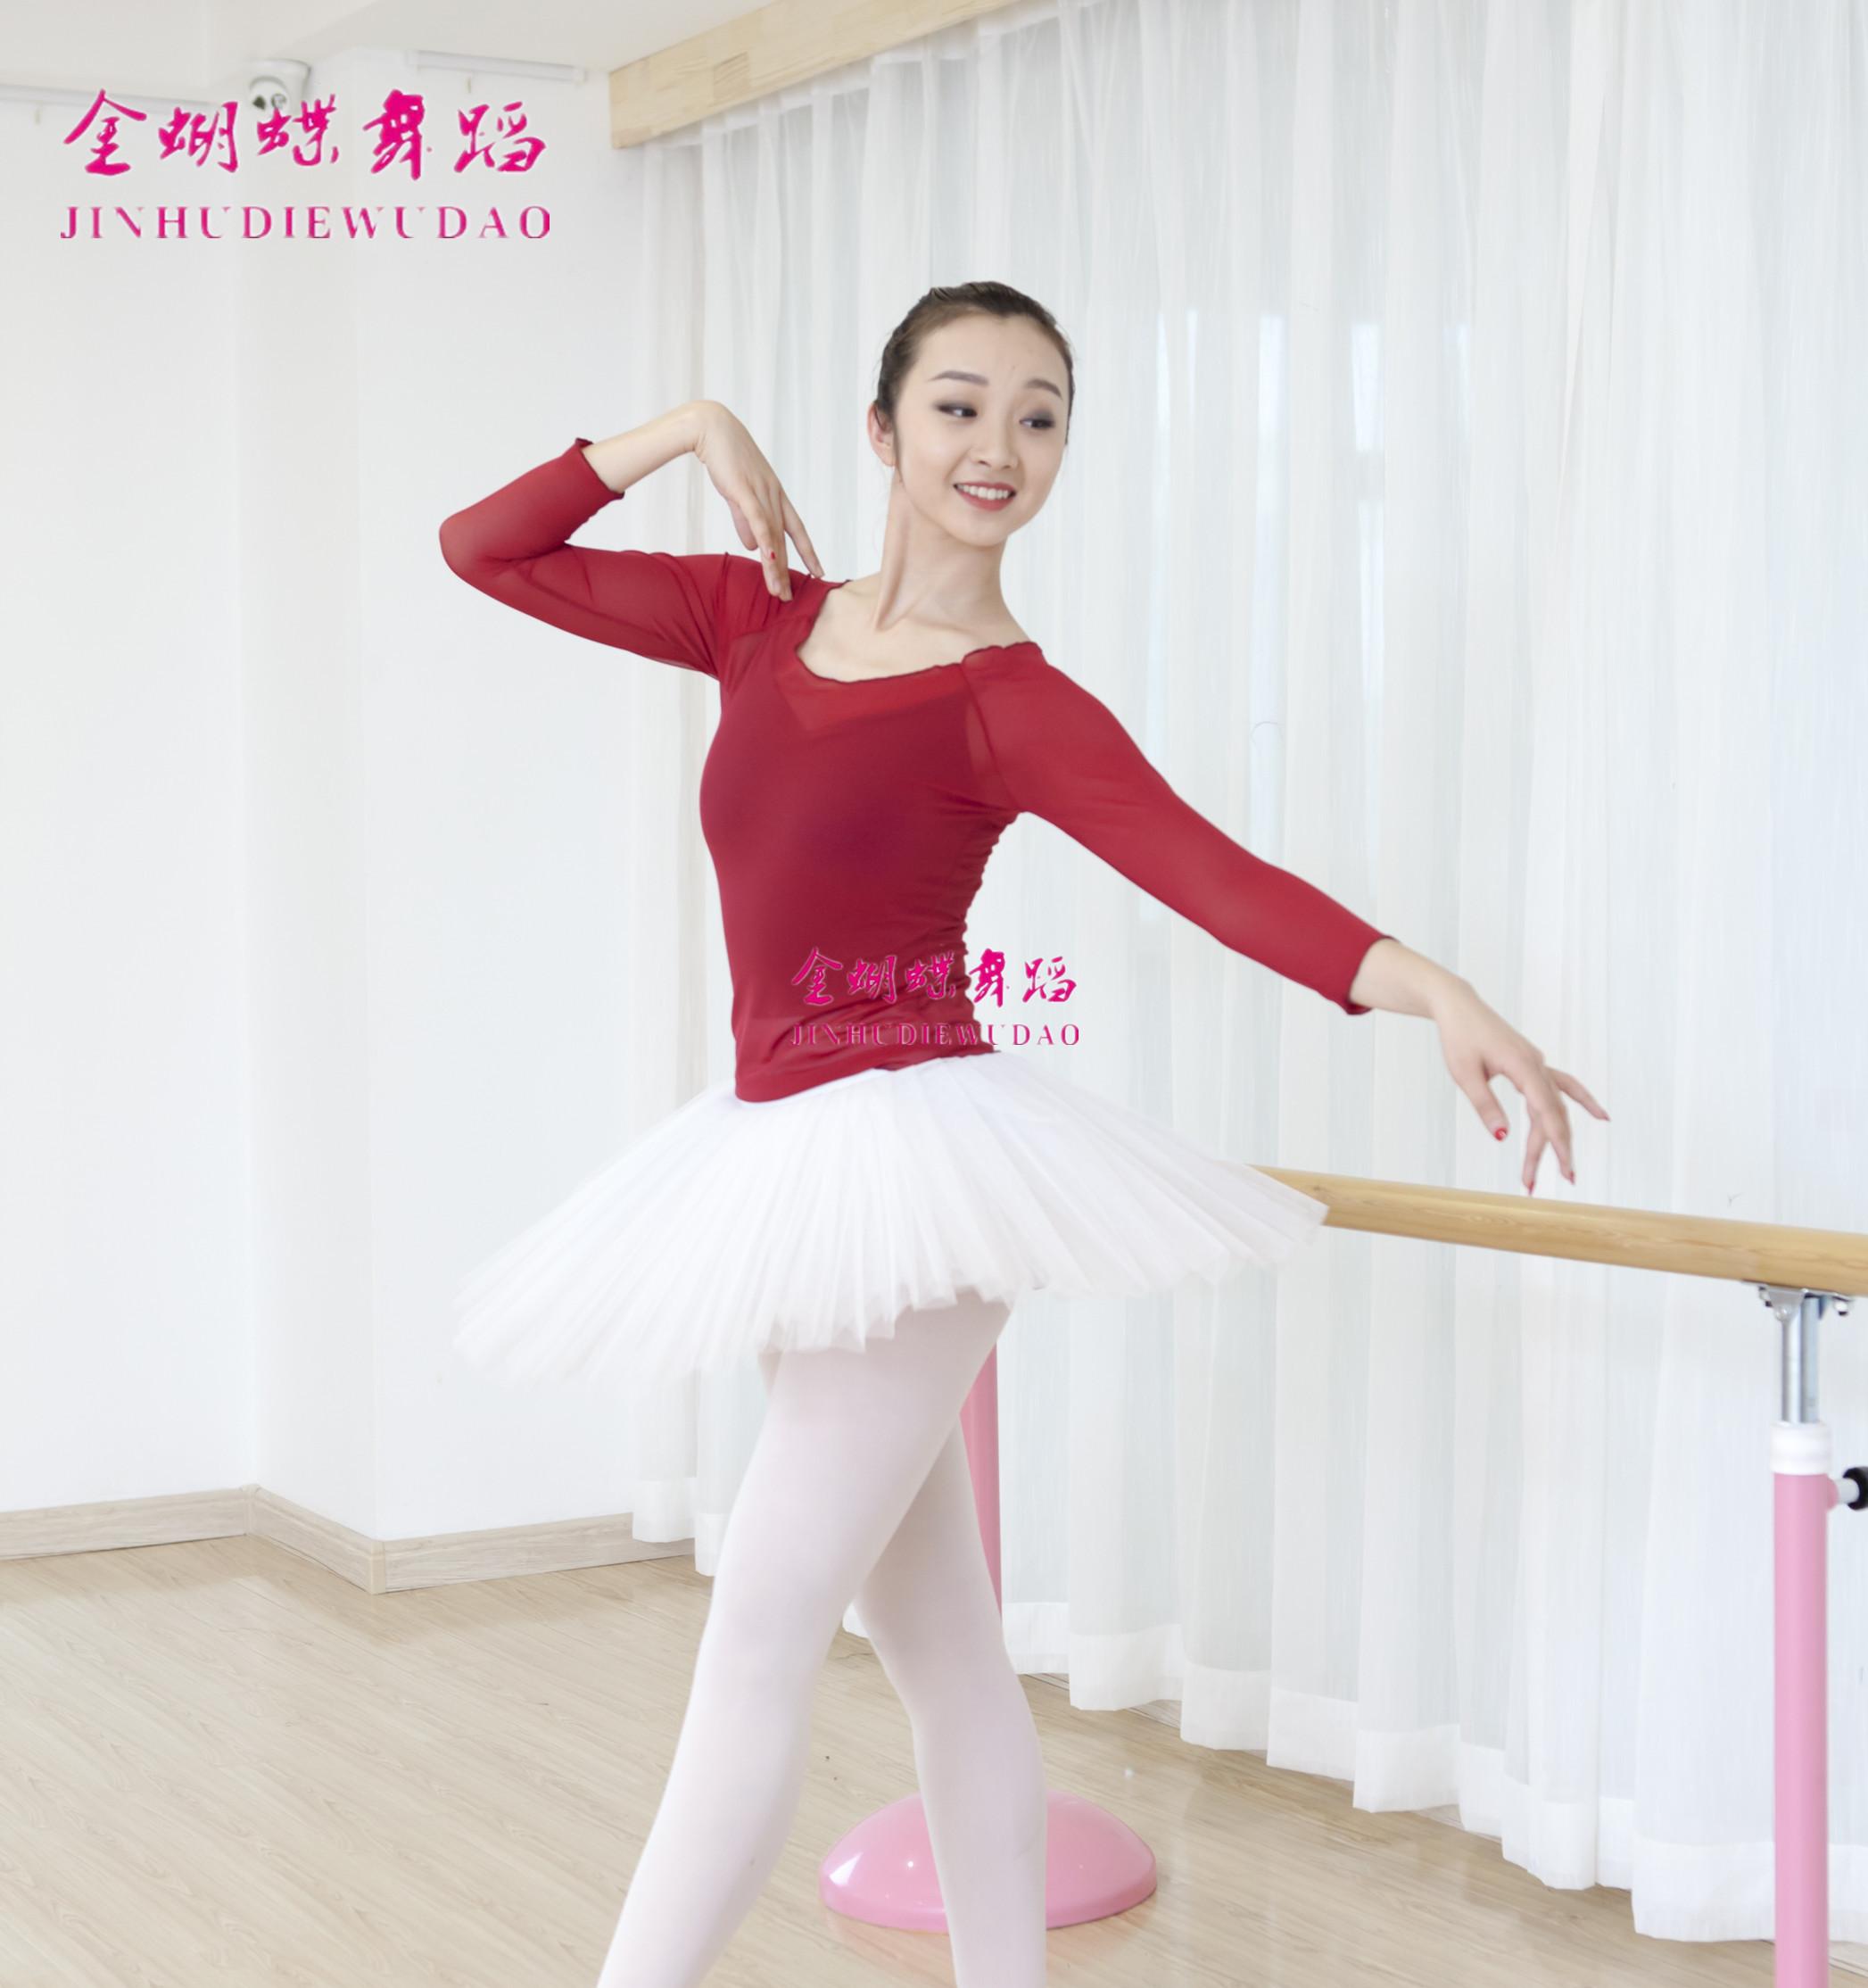 одежда для балета Jinhudie a123586244